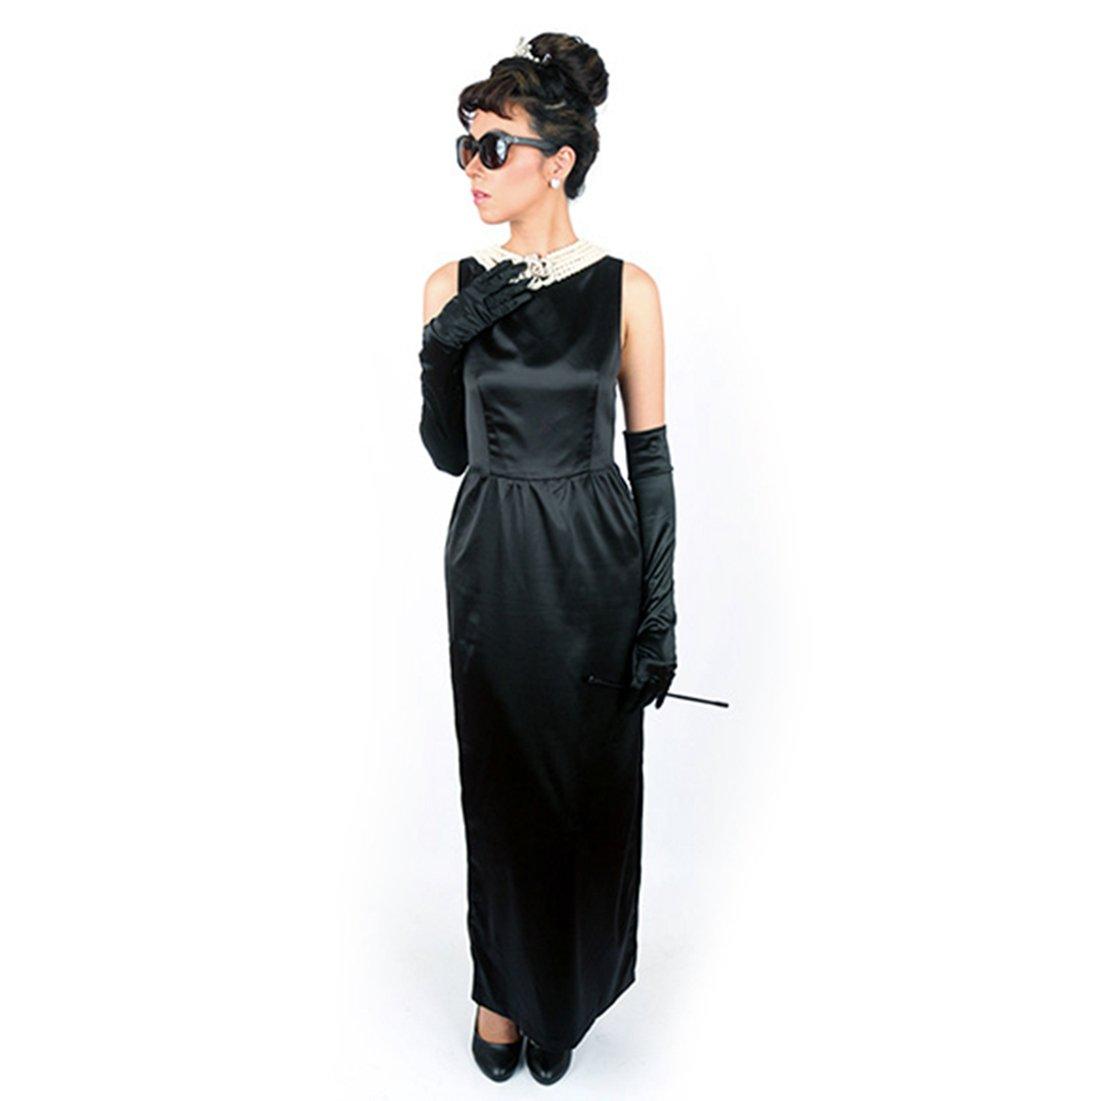 Audrey Hepburn ''Breakfast at Tiffany's'' Complete Costume Set - Satin Version (S) w/Gift Box by Utopiat (Image #2)